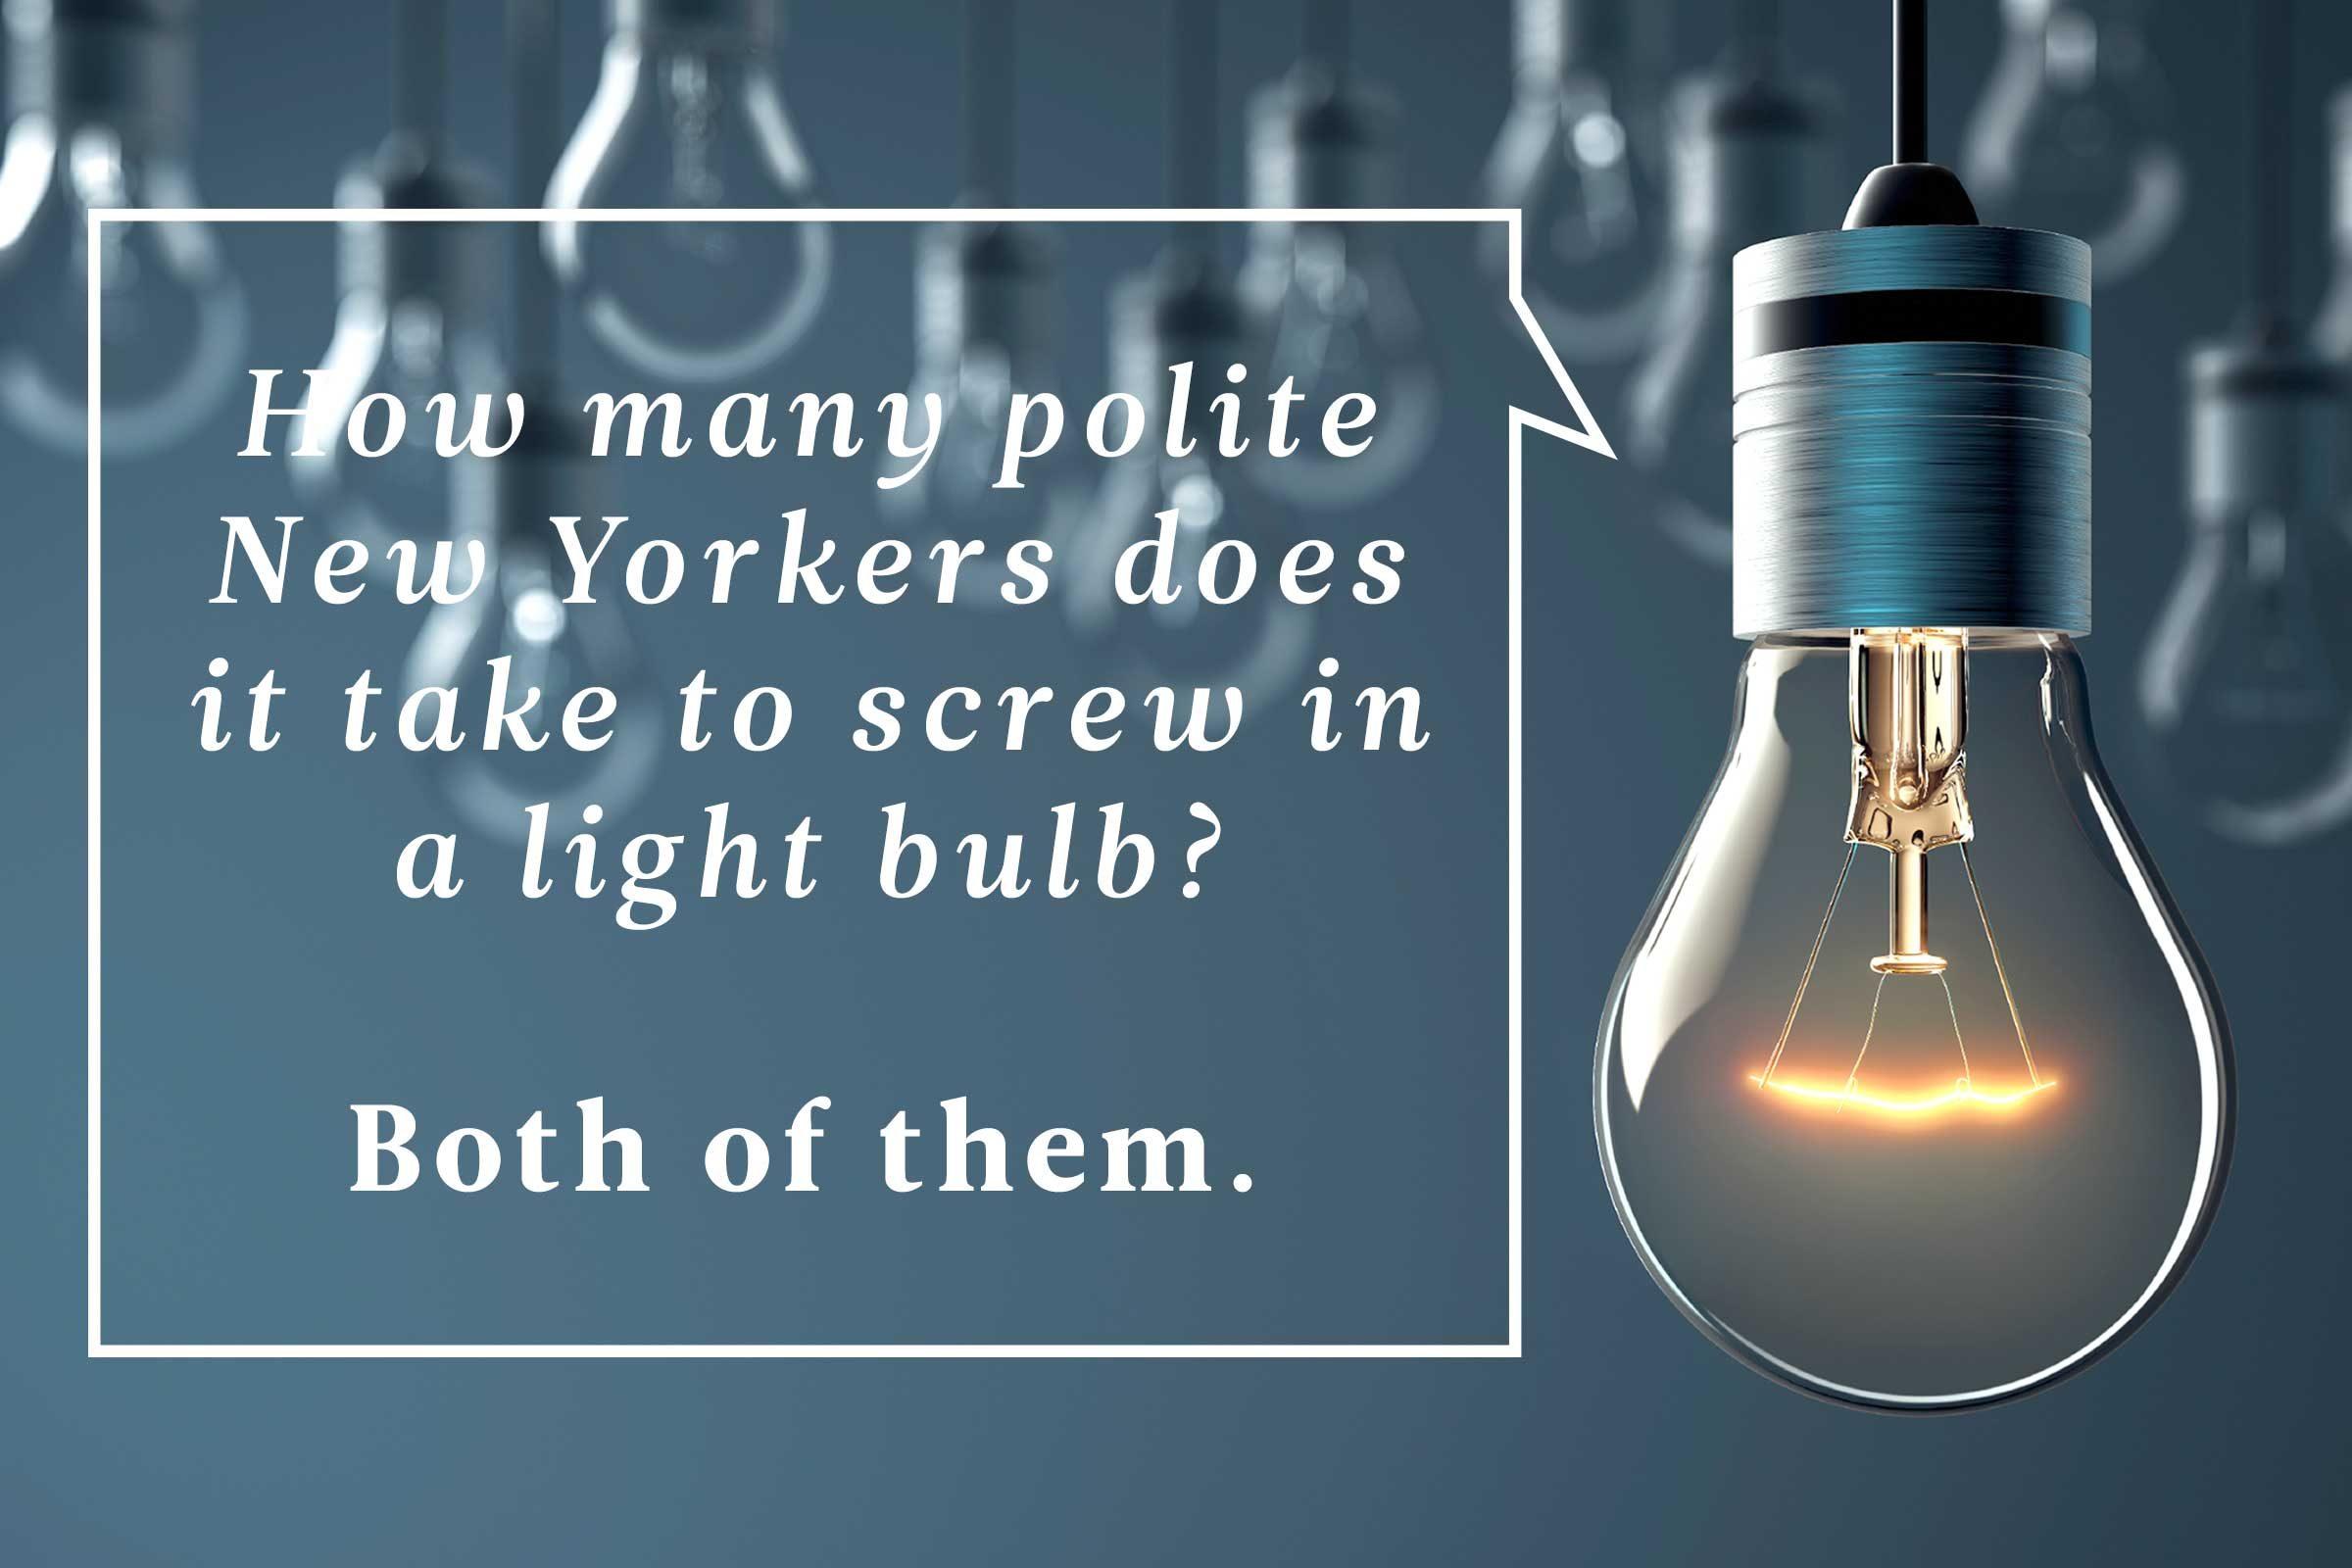 light bulb jokes that make you sound smart